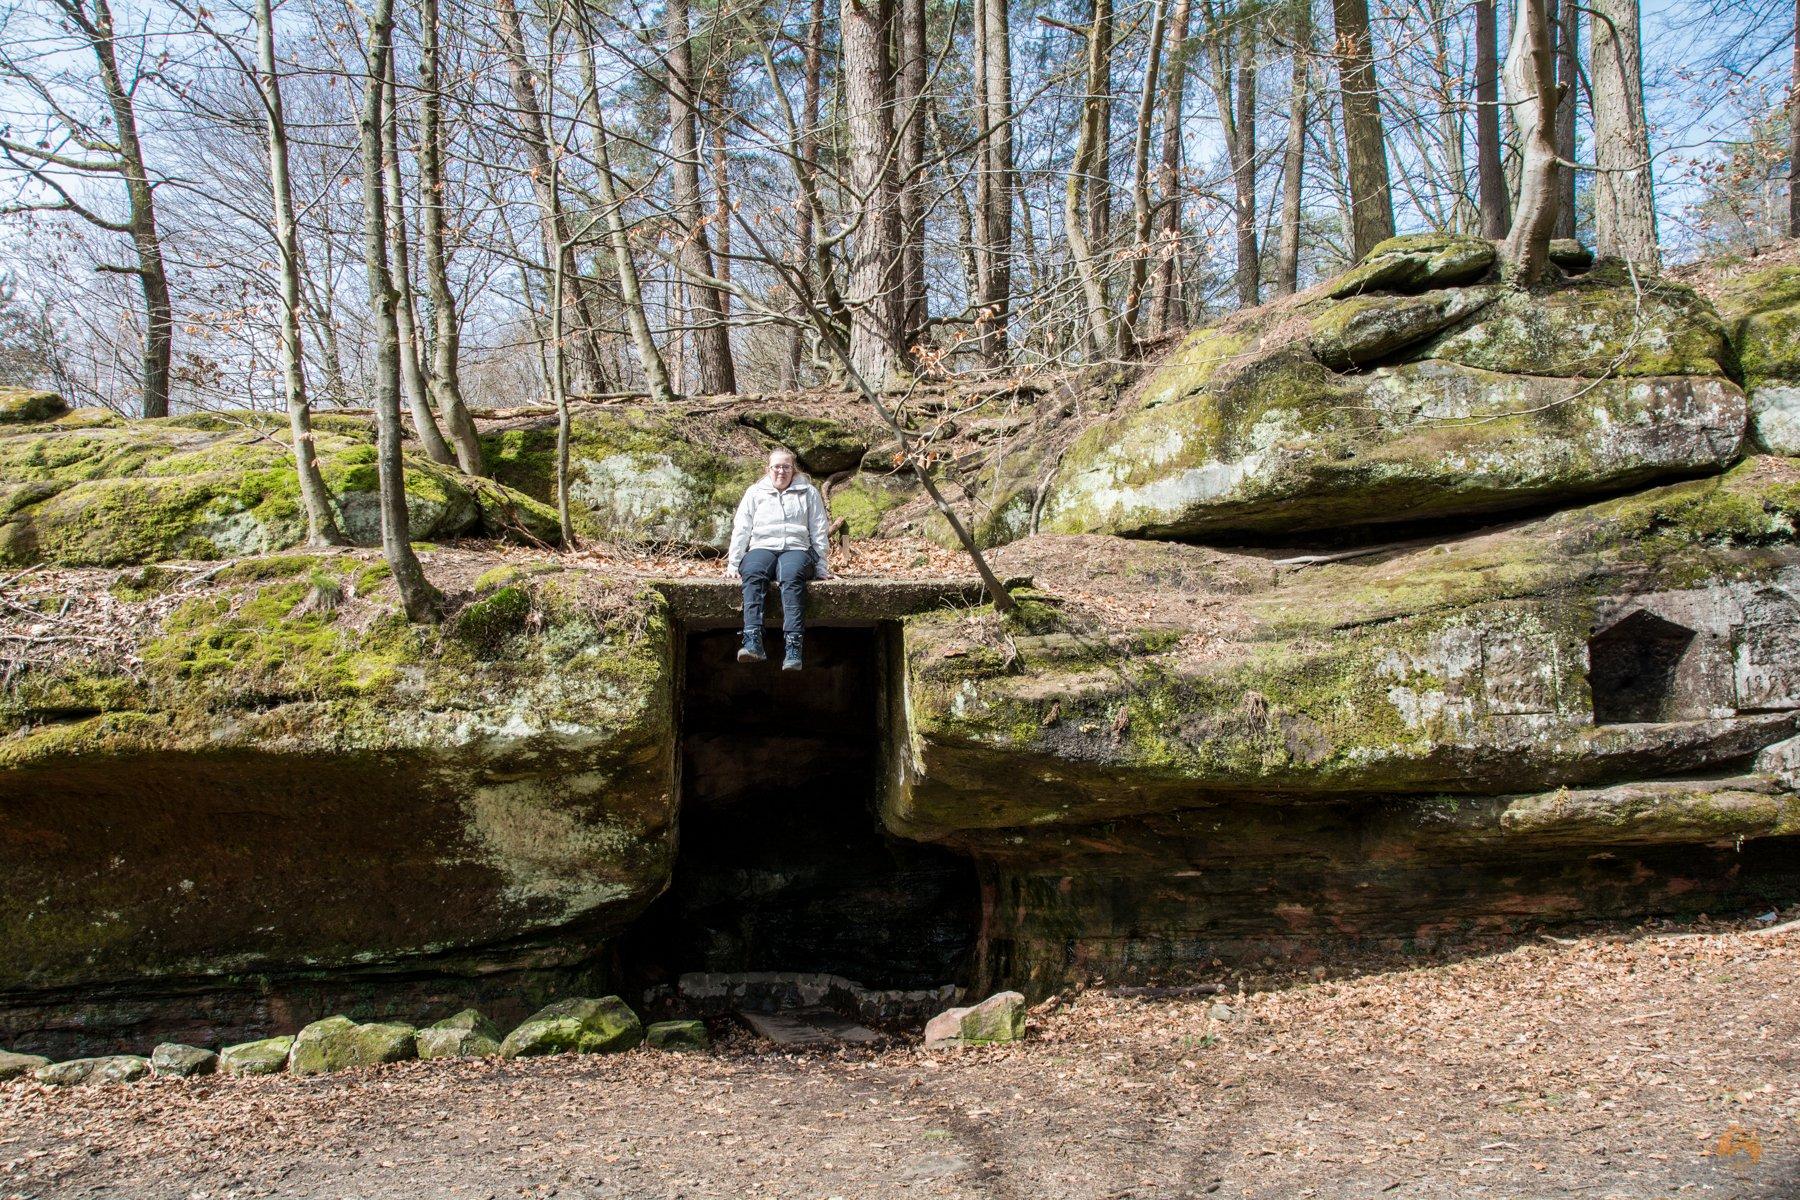 Wandern im Saarland - Kirkel Felsenpfad - Frauenbrunnen